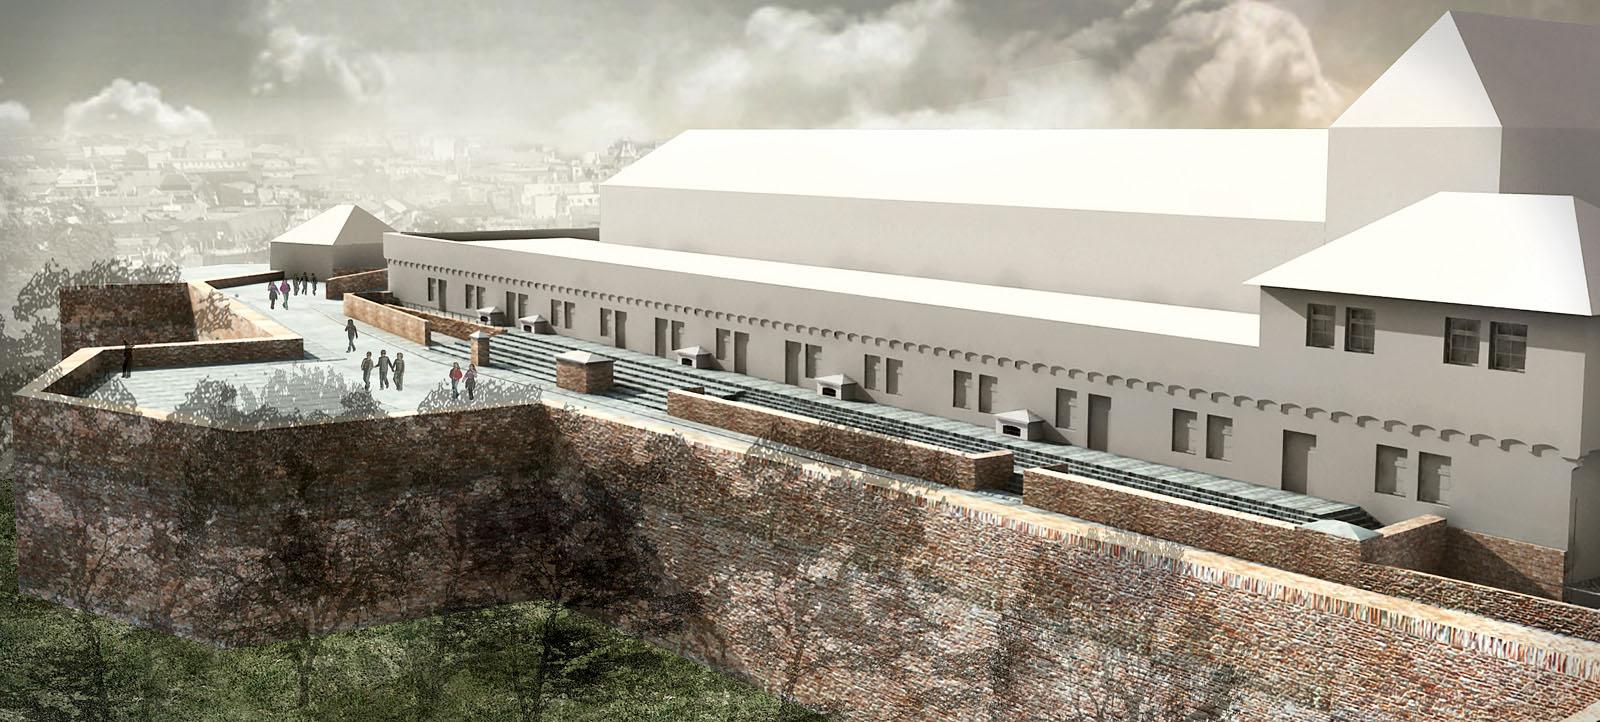 rekonstrukce hradu Špilberk | Brno | 11